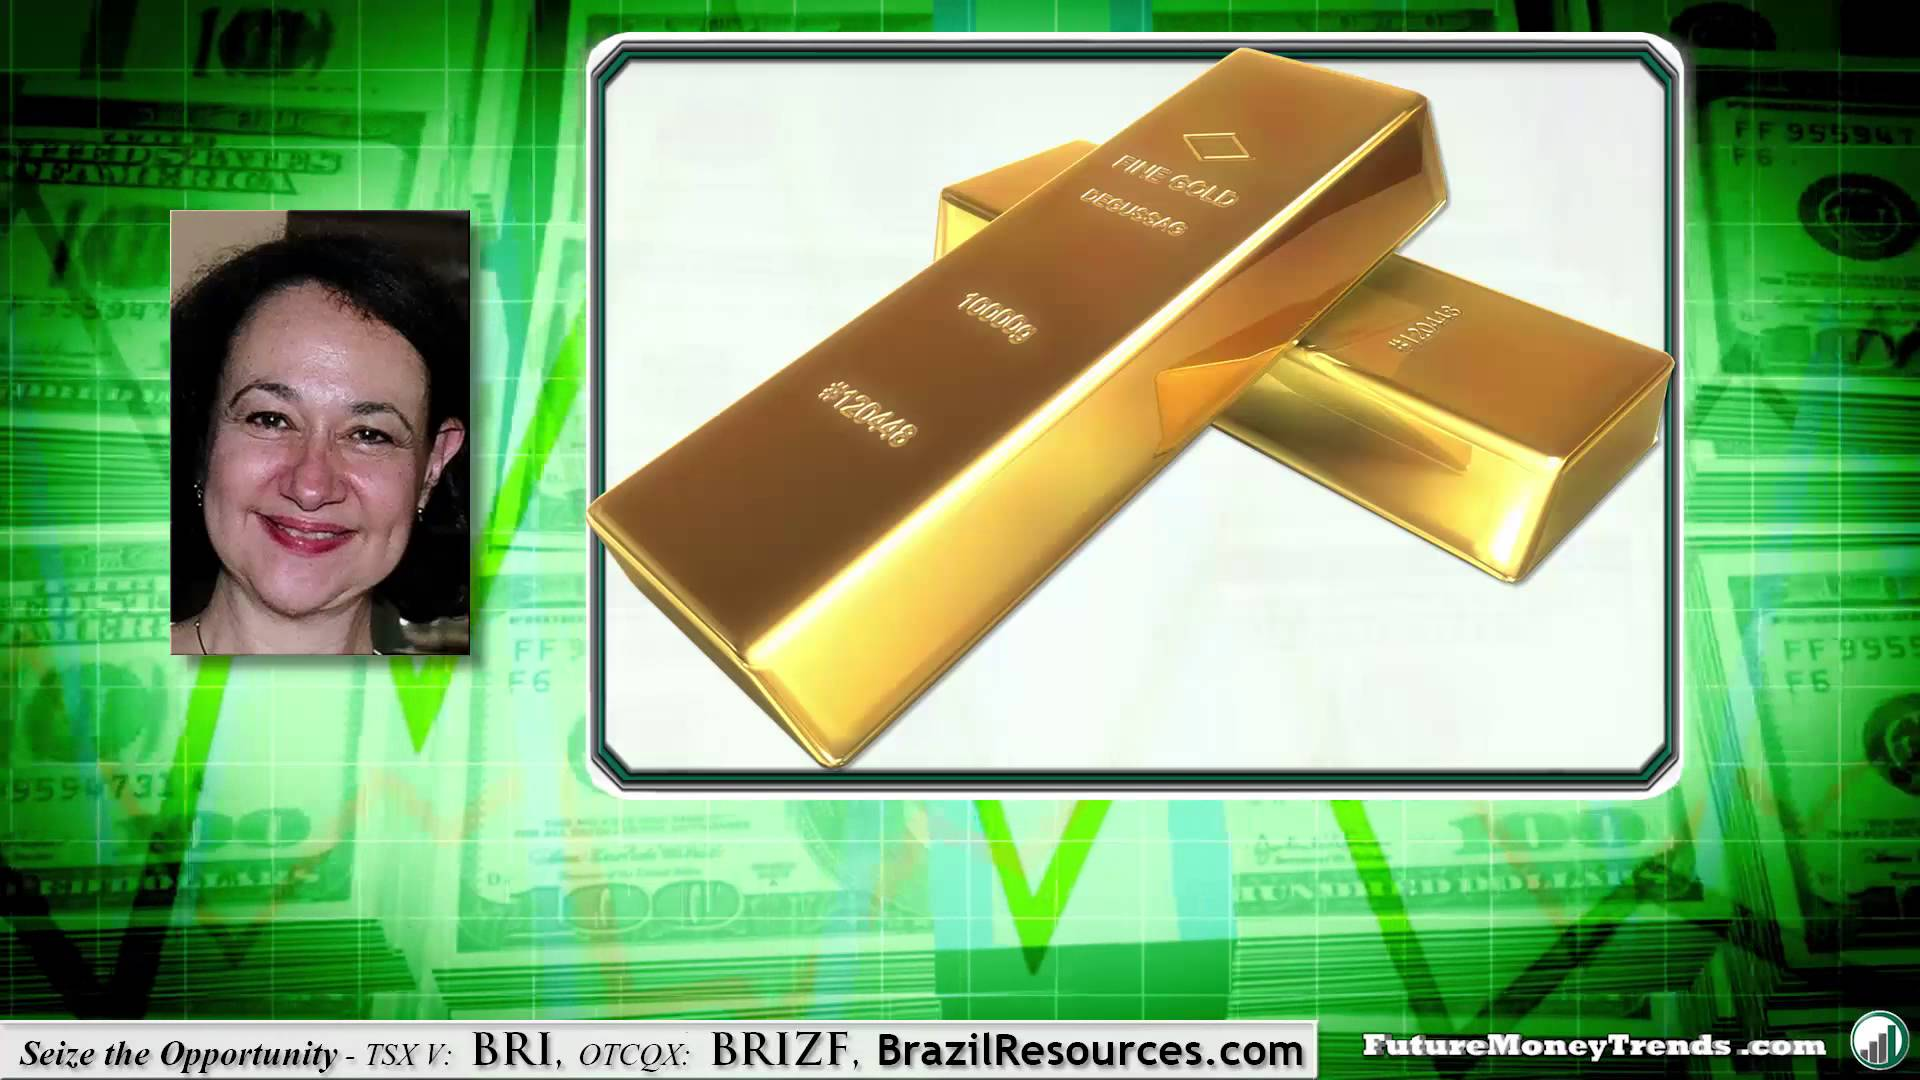 World Bank Scandal & JFK killed over Gold Backed Dollars